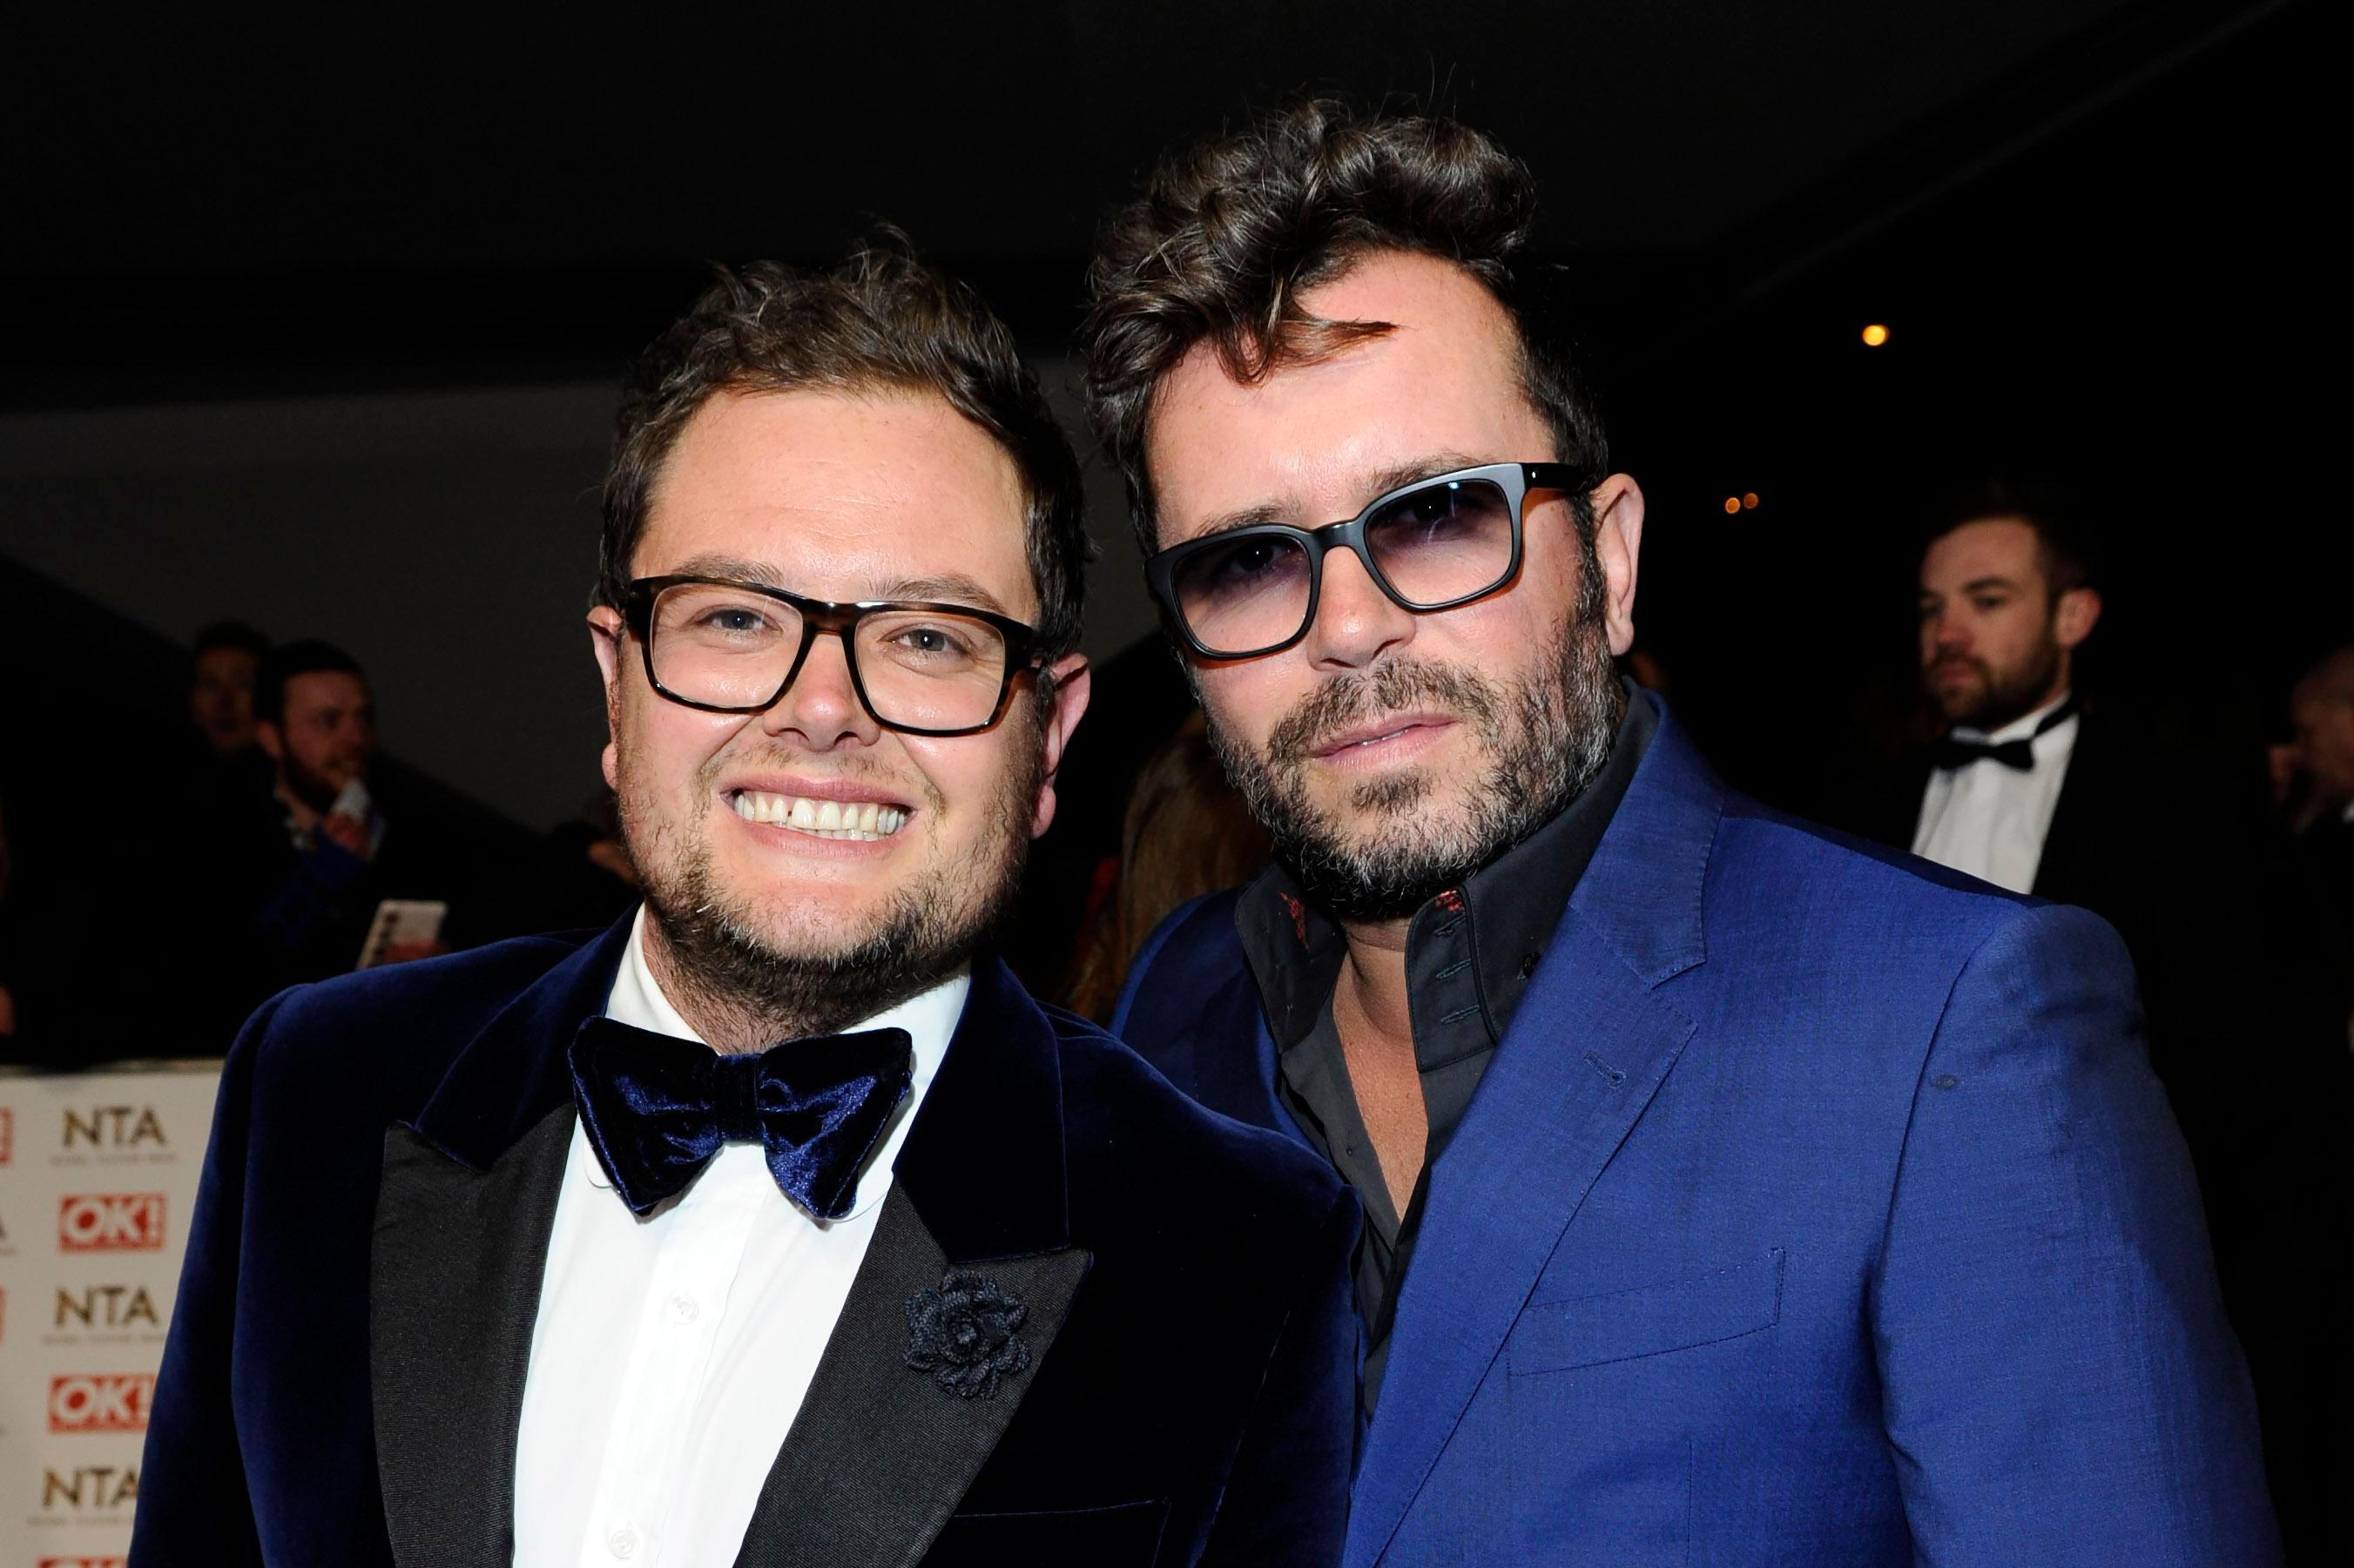 Alan Carr and fiance Paul Drayton tie the knot in secret wedding in LA